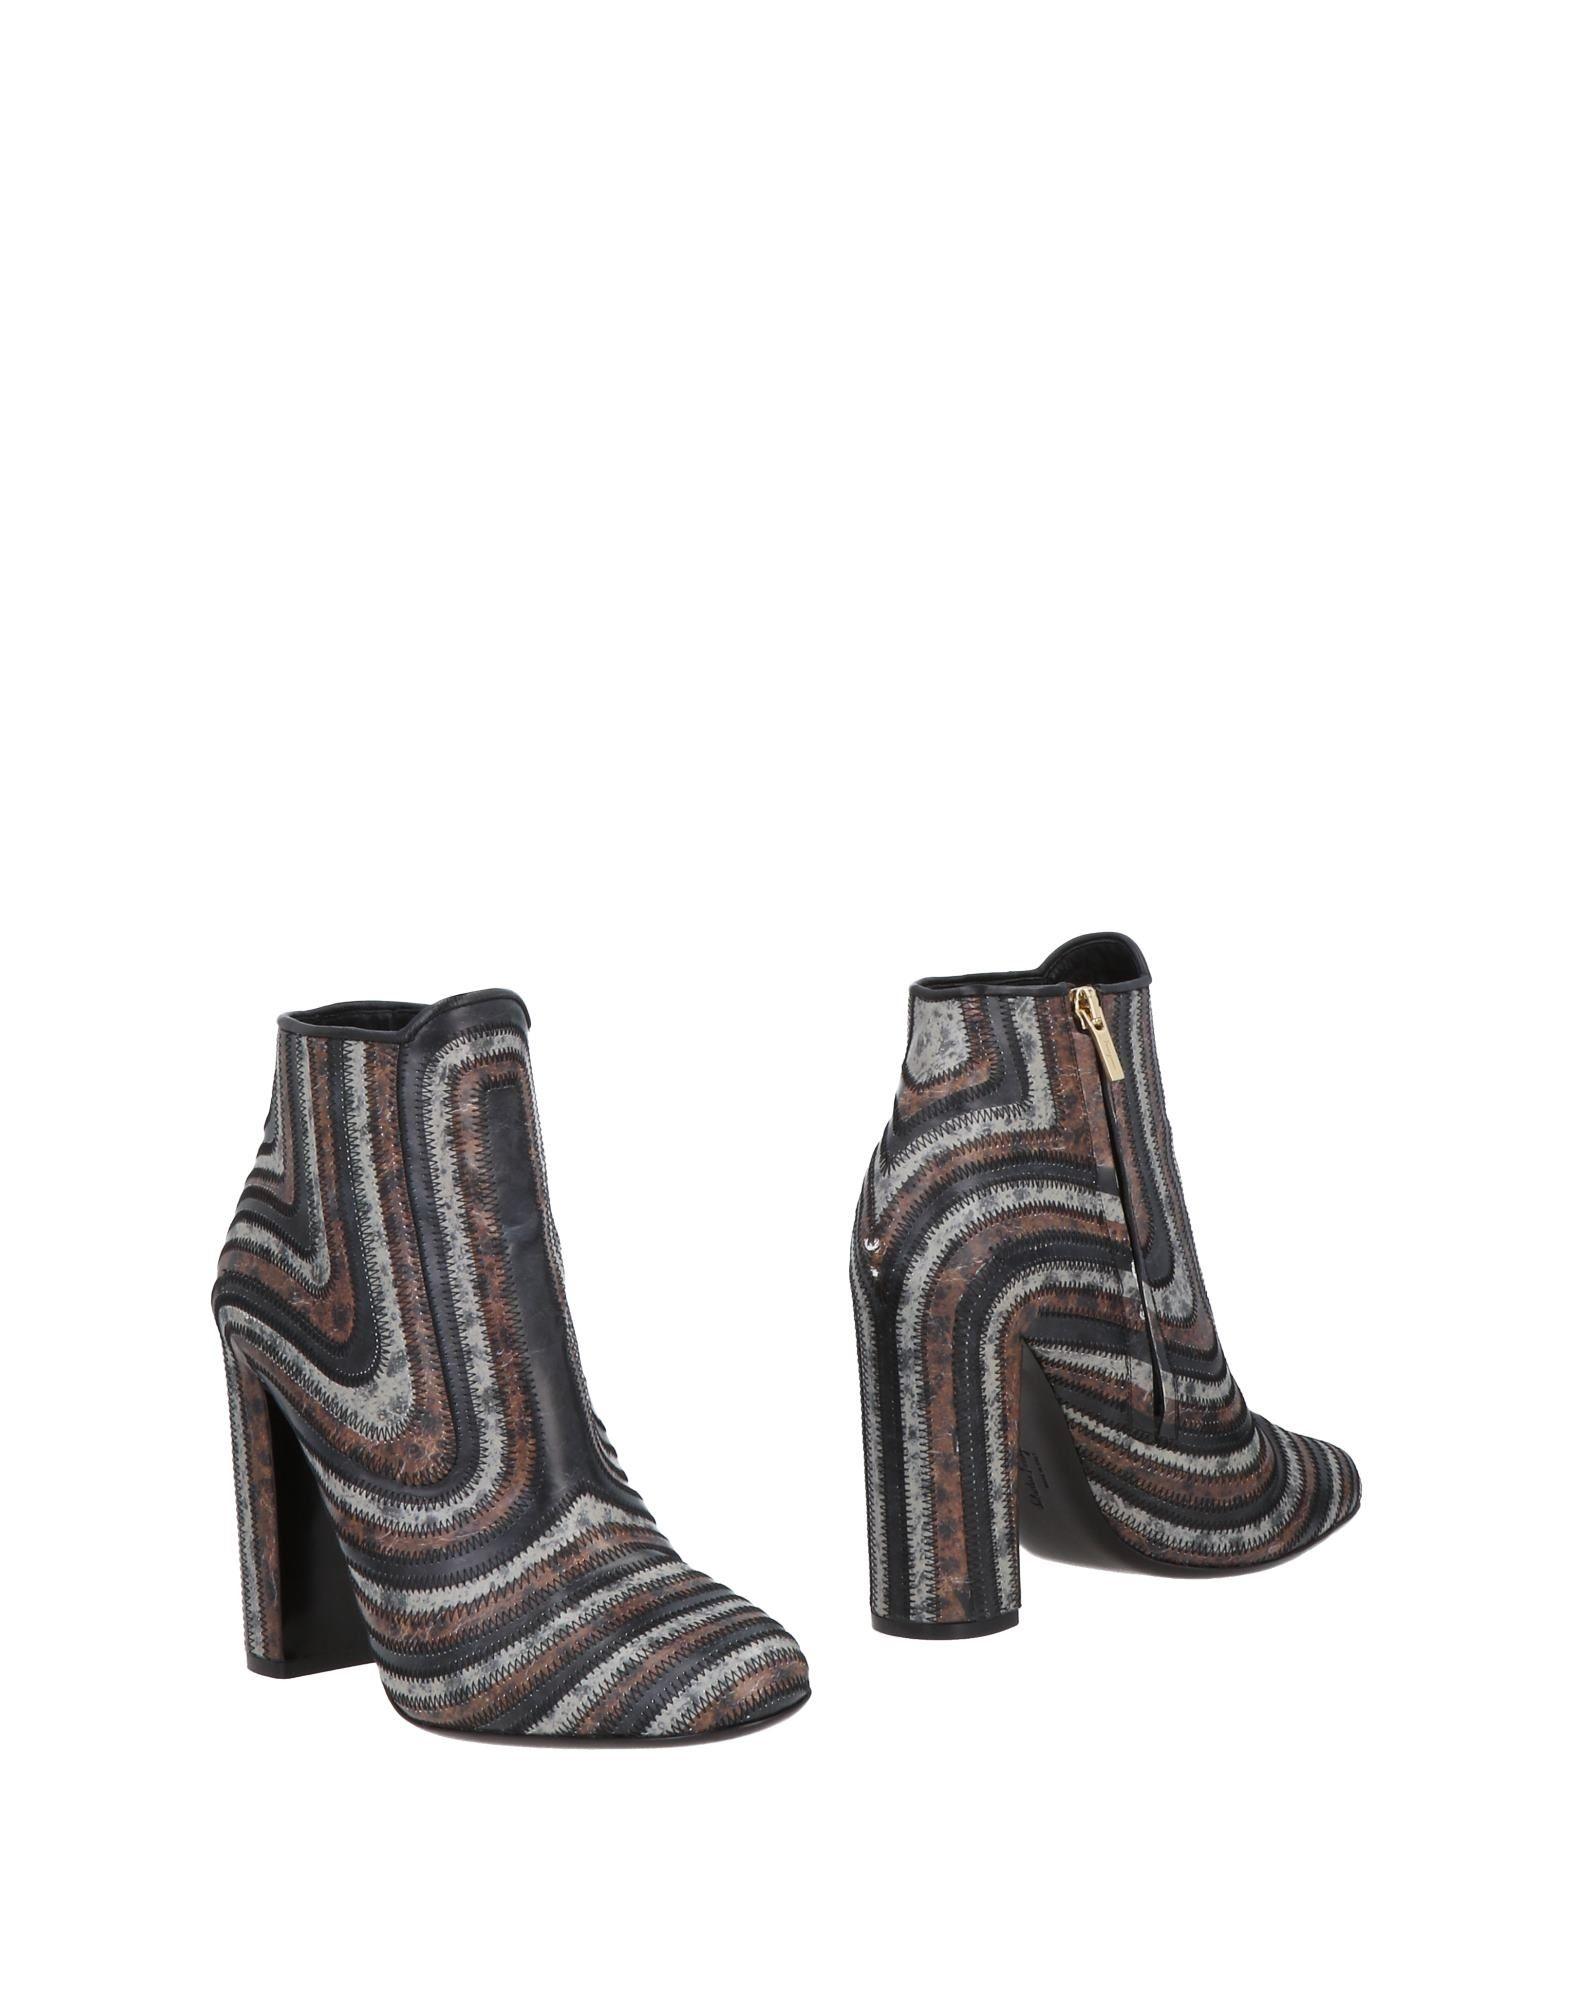 Salvatore Ferragamo Stiefelette Damen  11483780PH Beliebte Schuhe